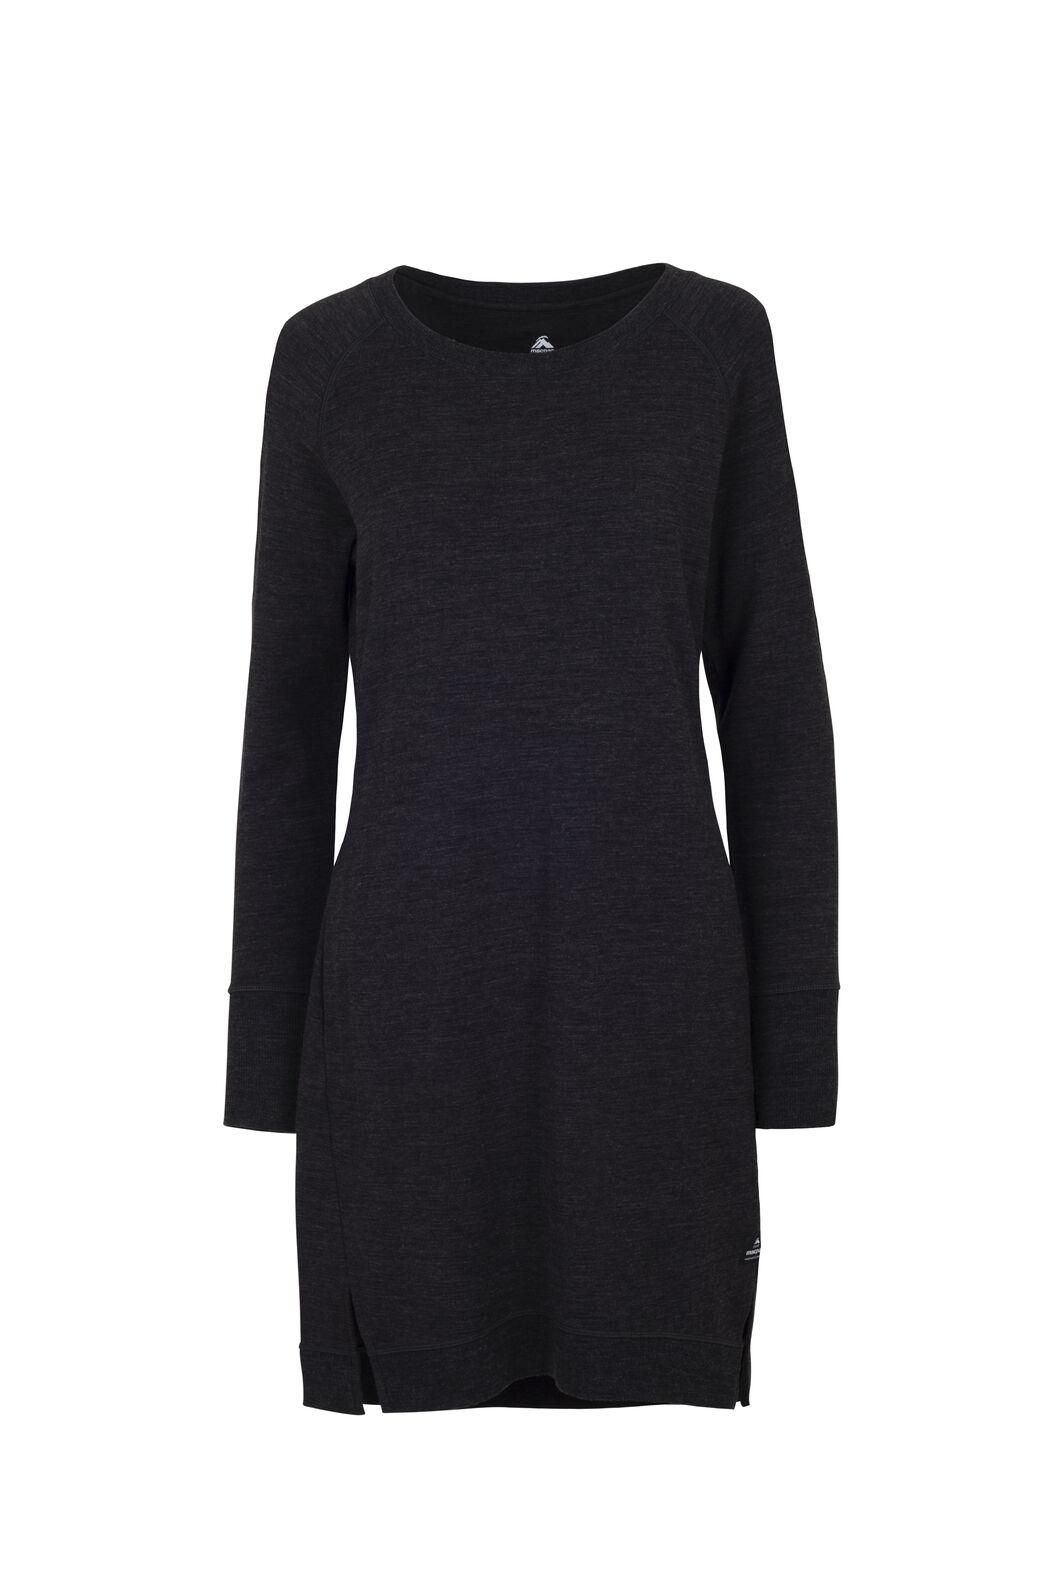 Macpac Platform Dress - Women's, Charcoal Marle, hi-res